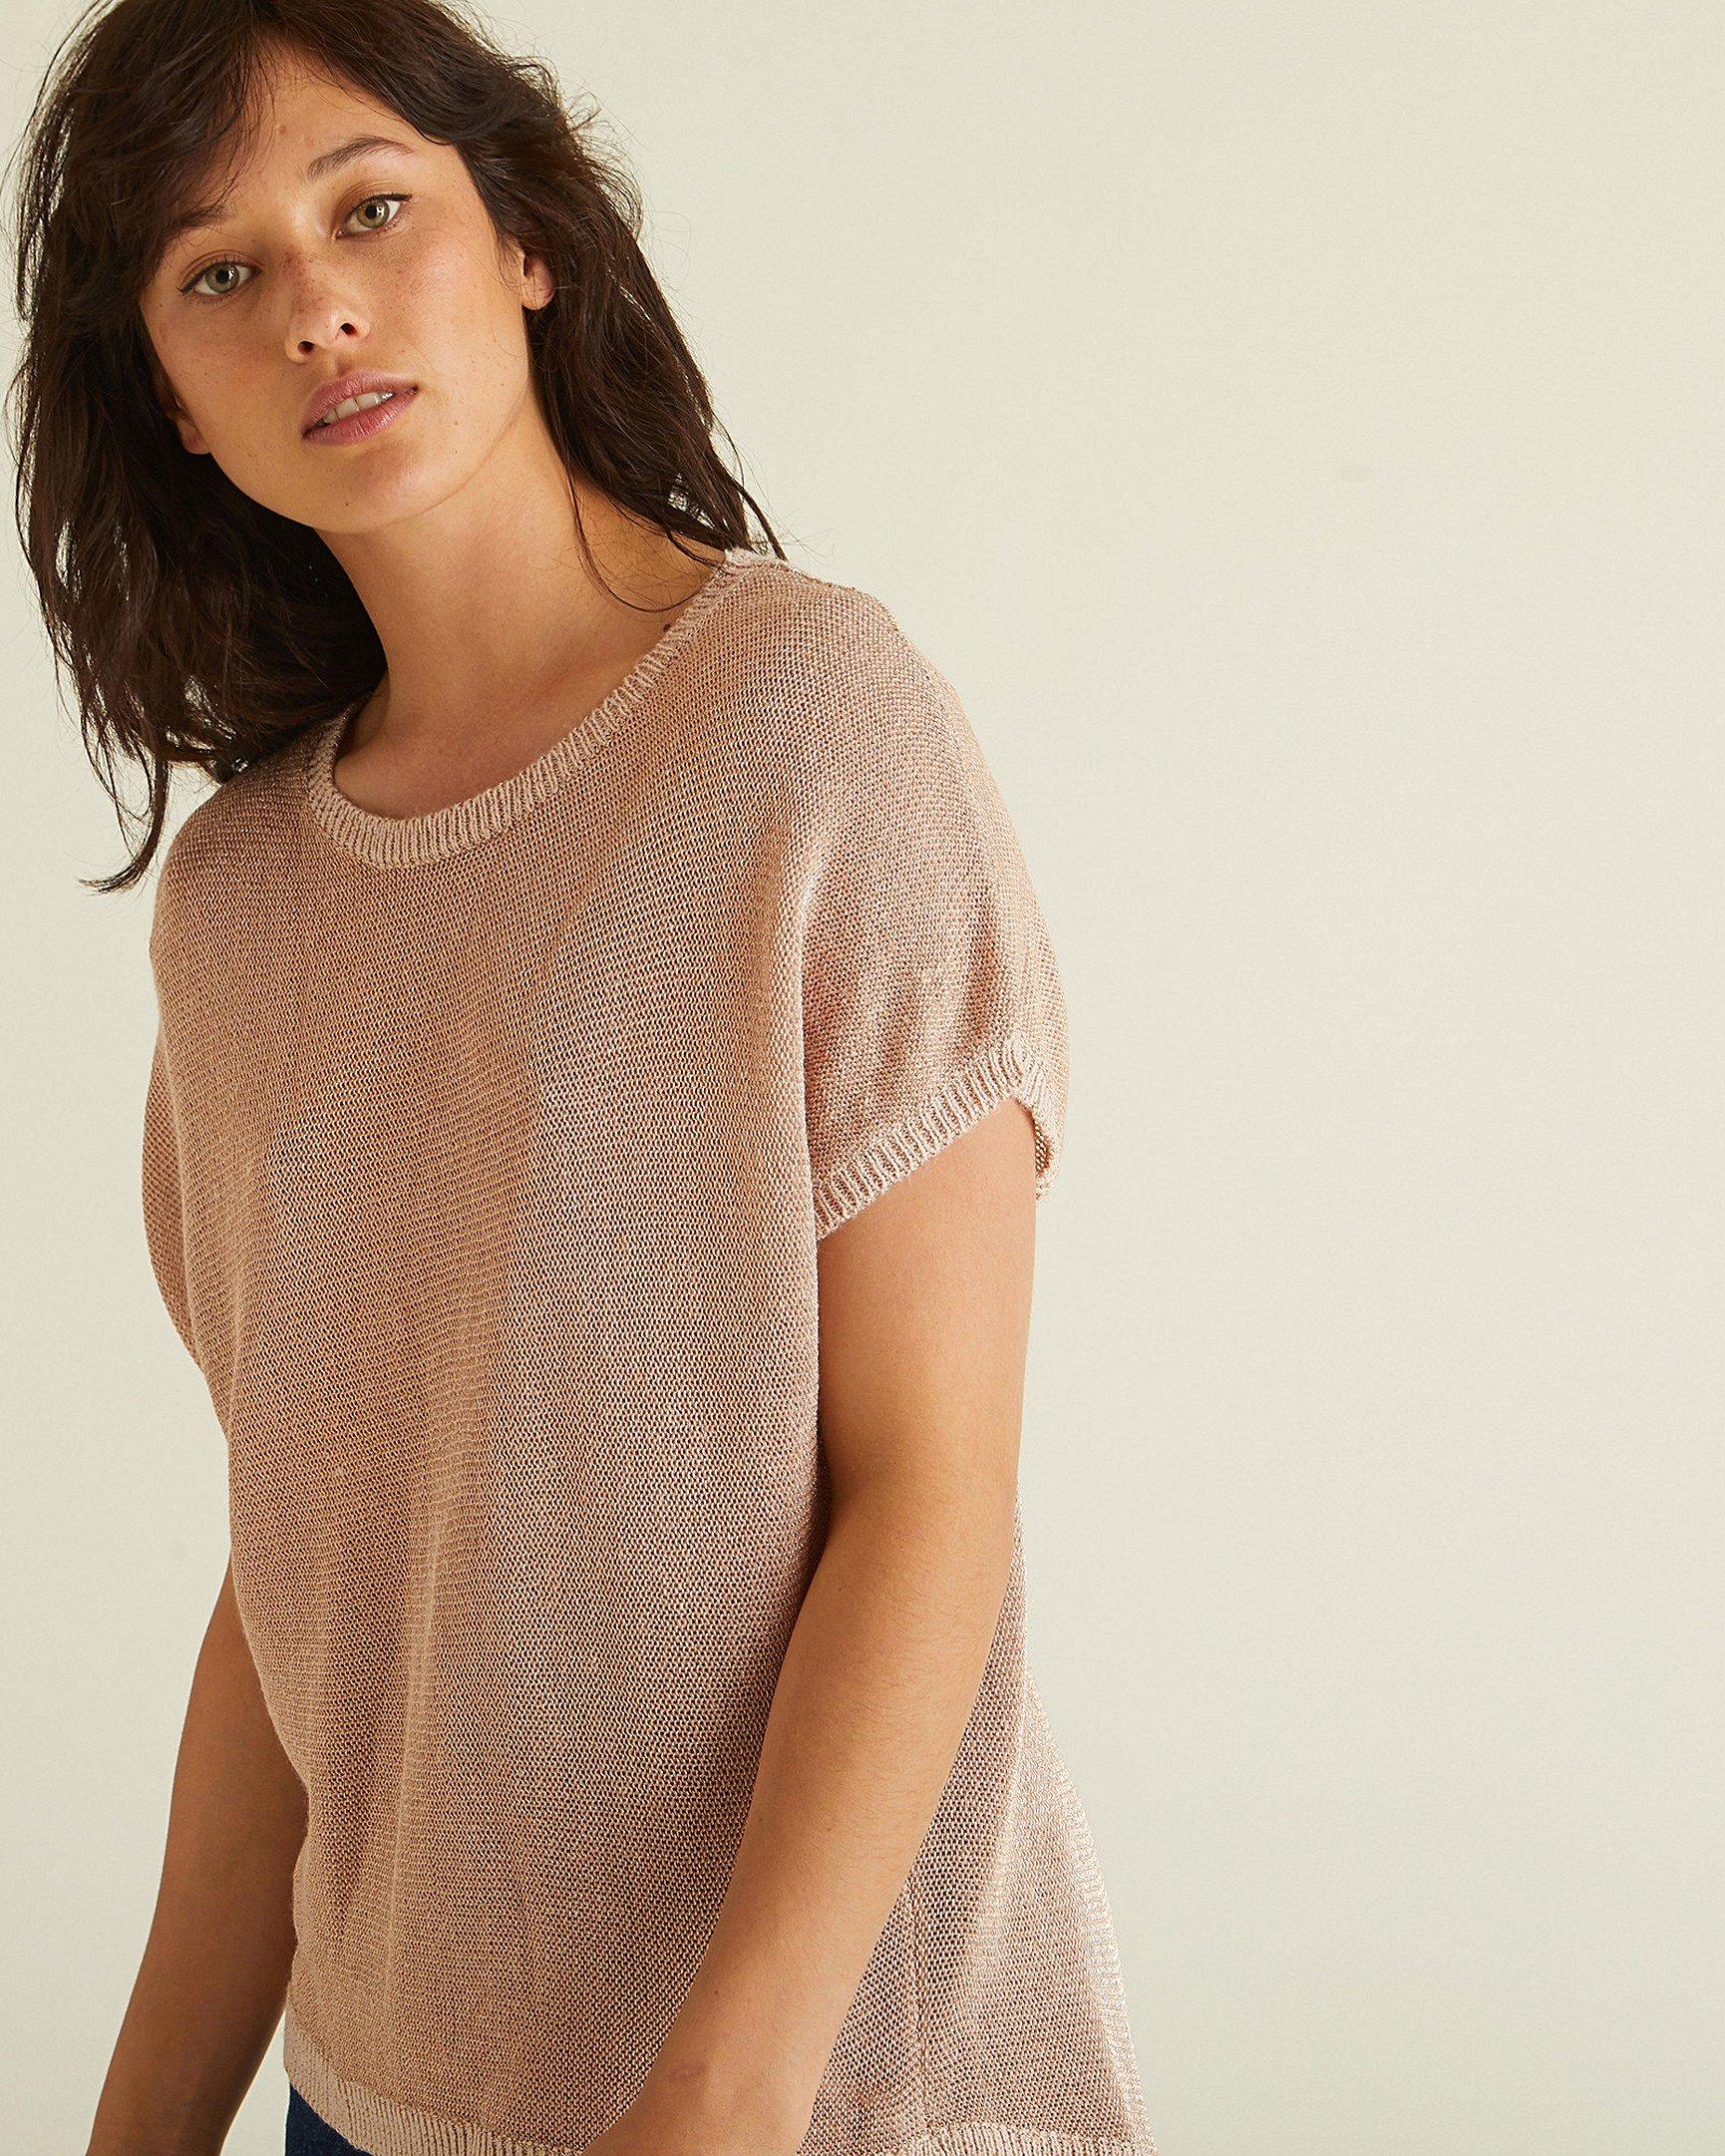 e878be097979c0 Tops | Blouses, Shirts & Tops for Women | Oliver Bonas